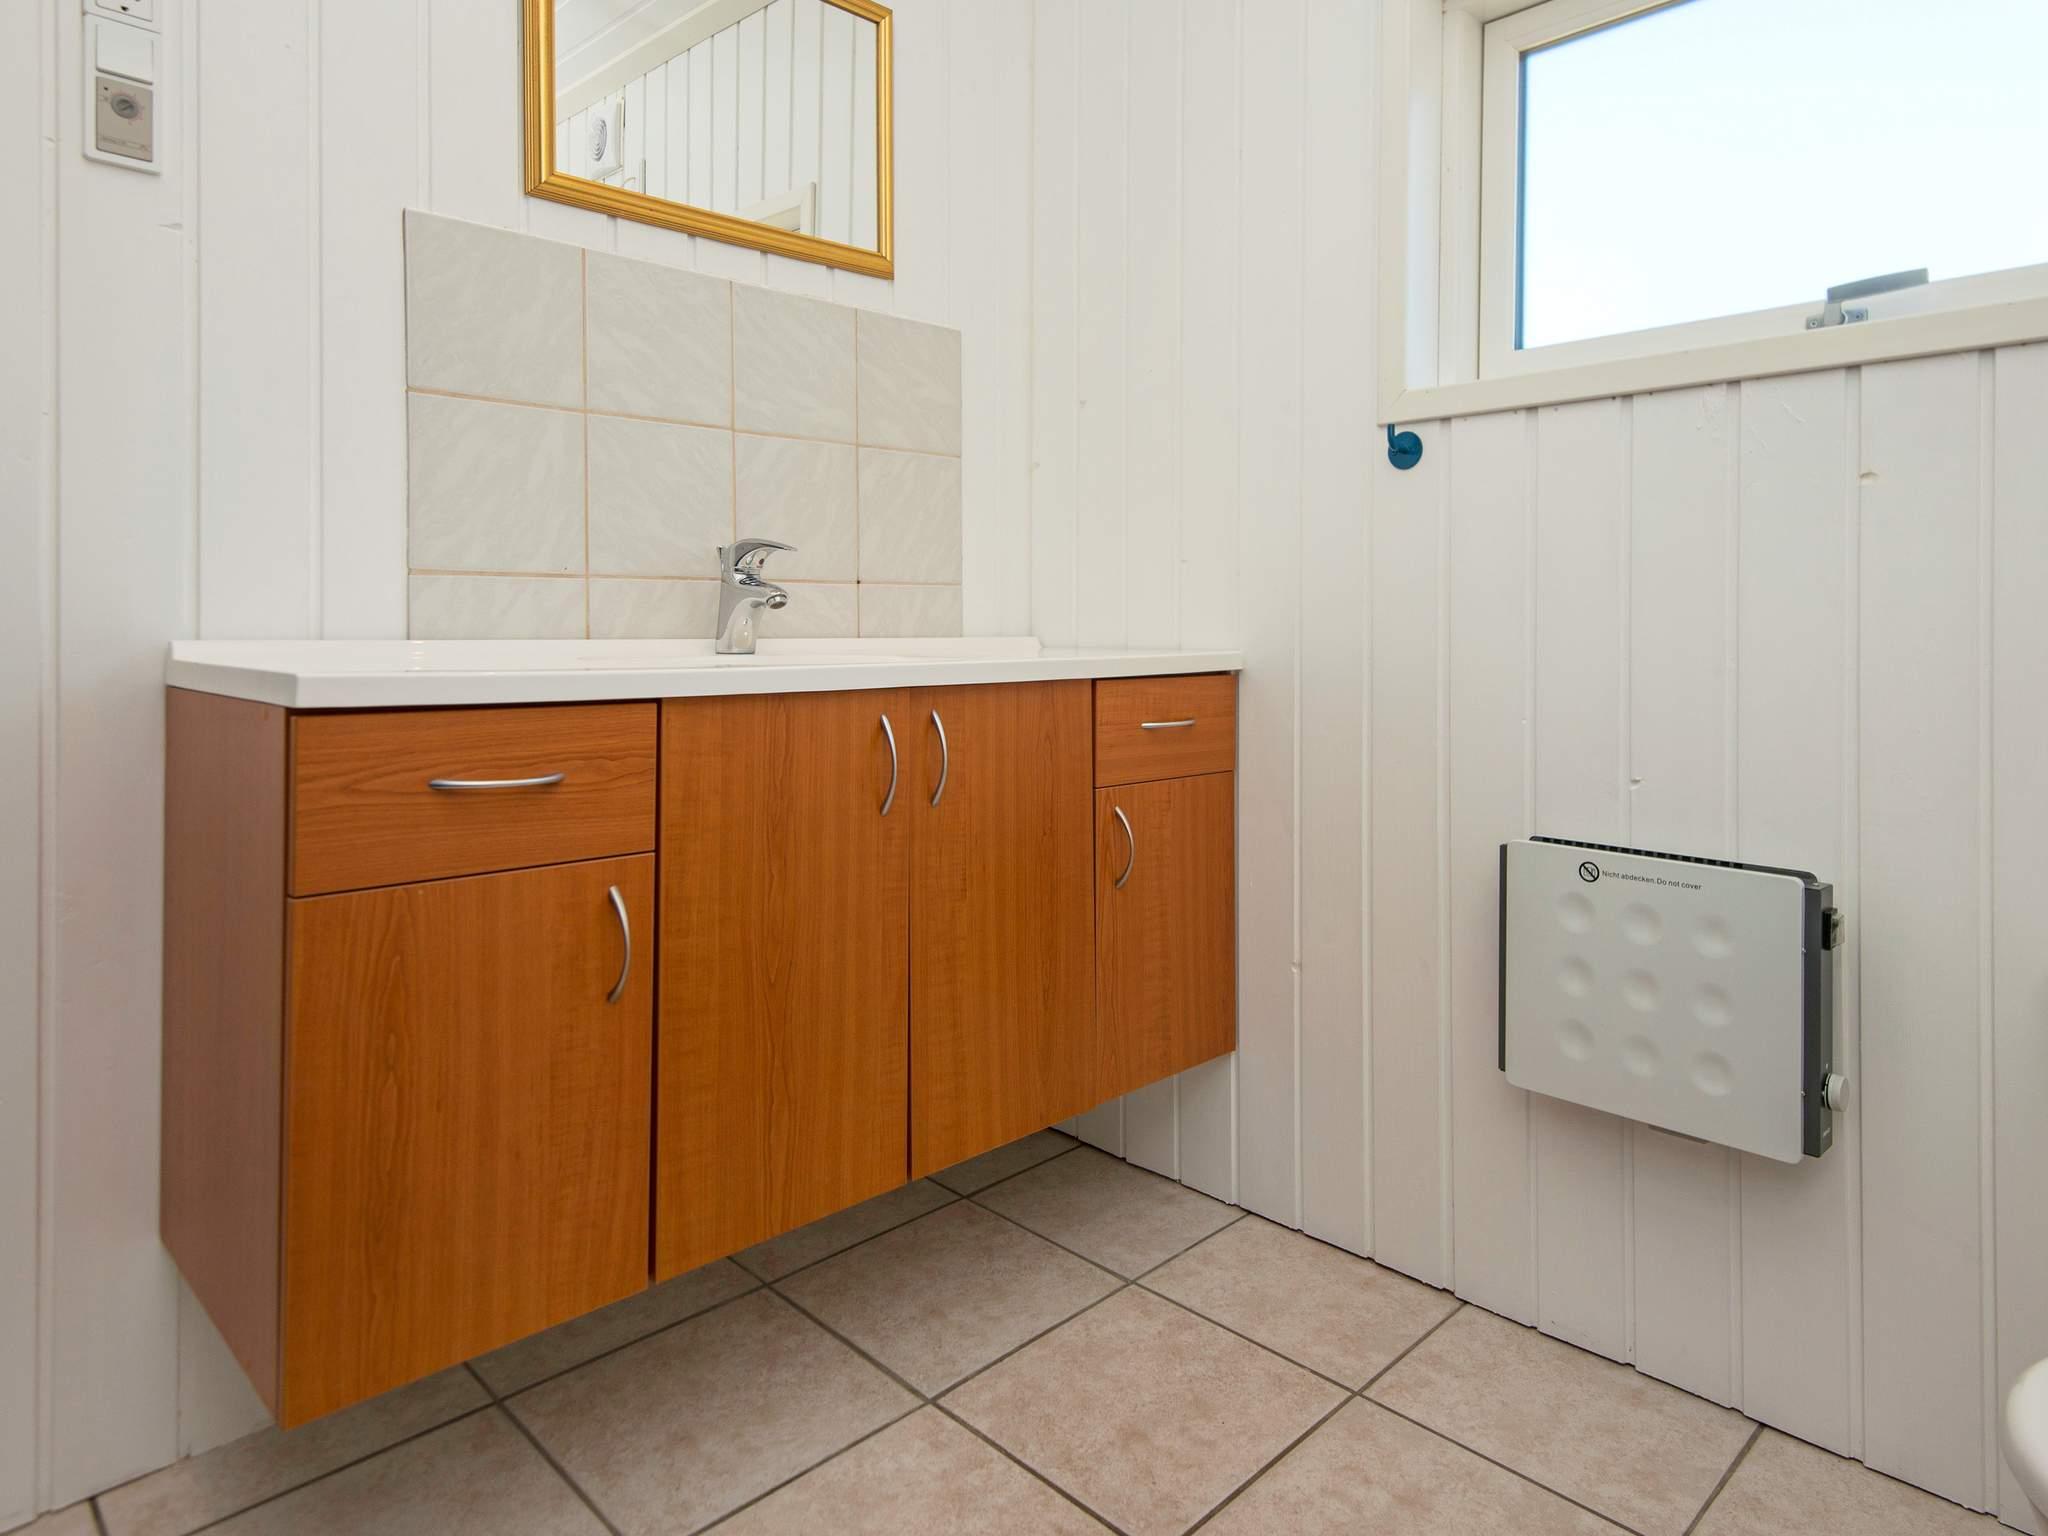 Maison de vacances Helgenæs (978615), Knebel, , Jutland Est, Danemark, image 12